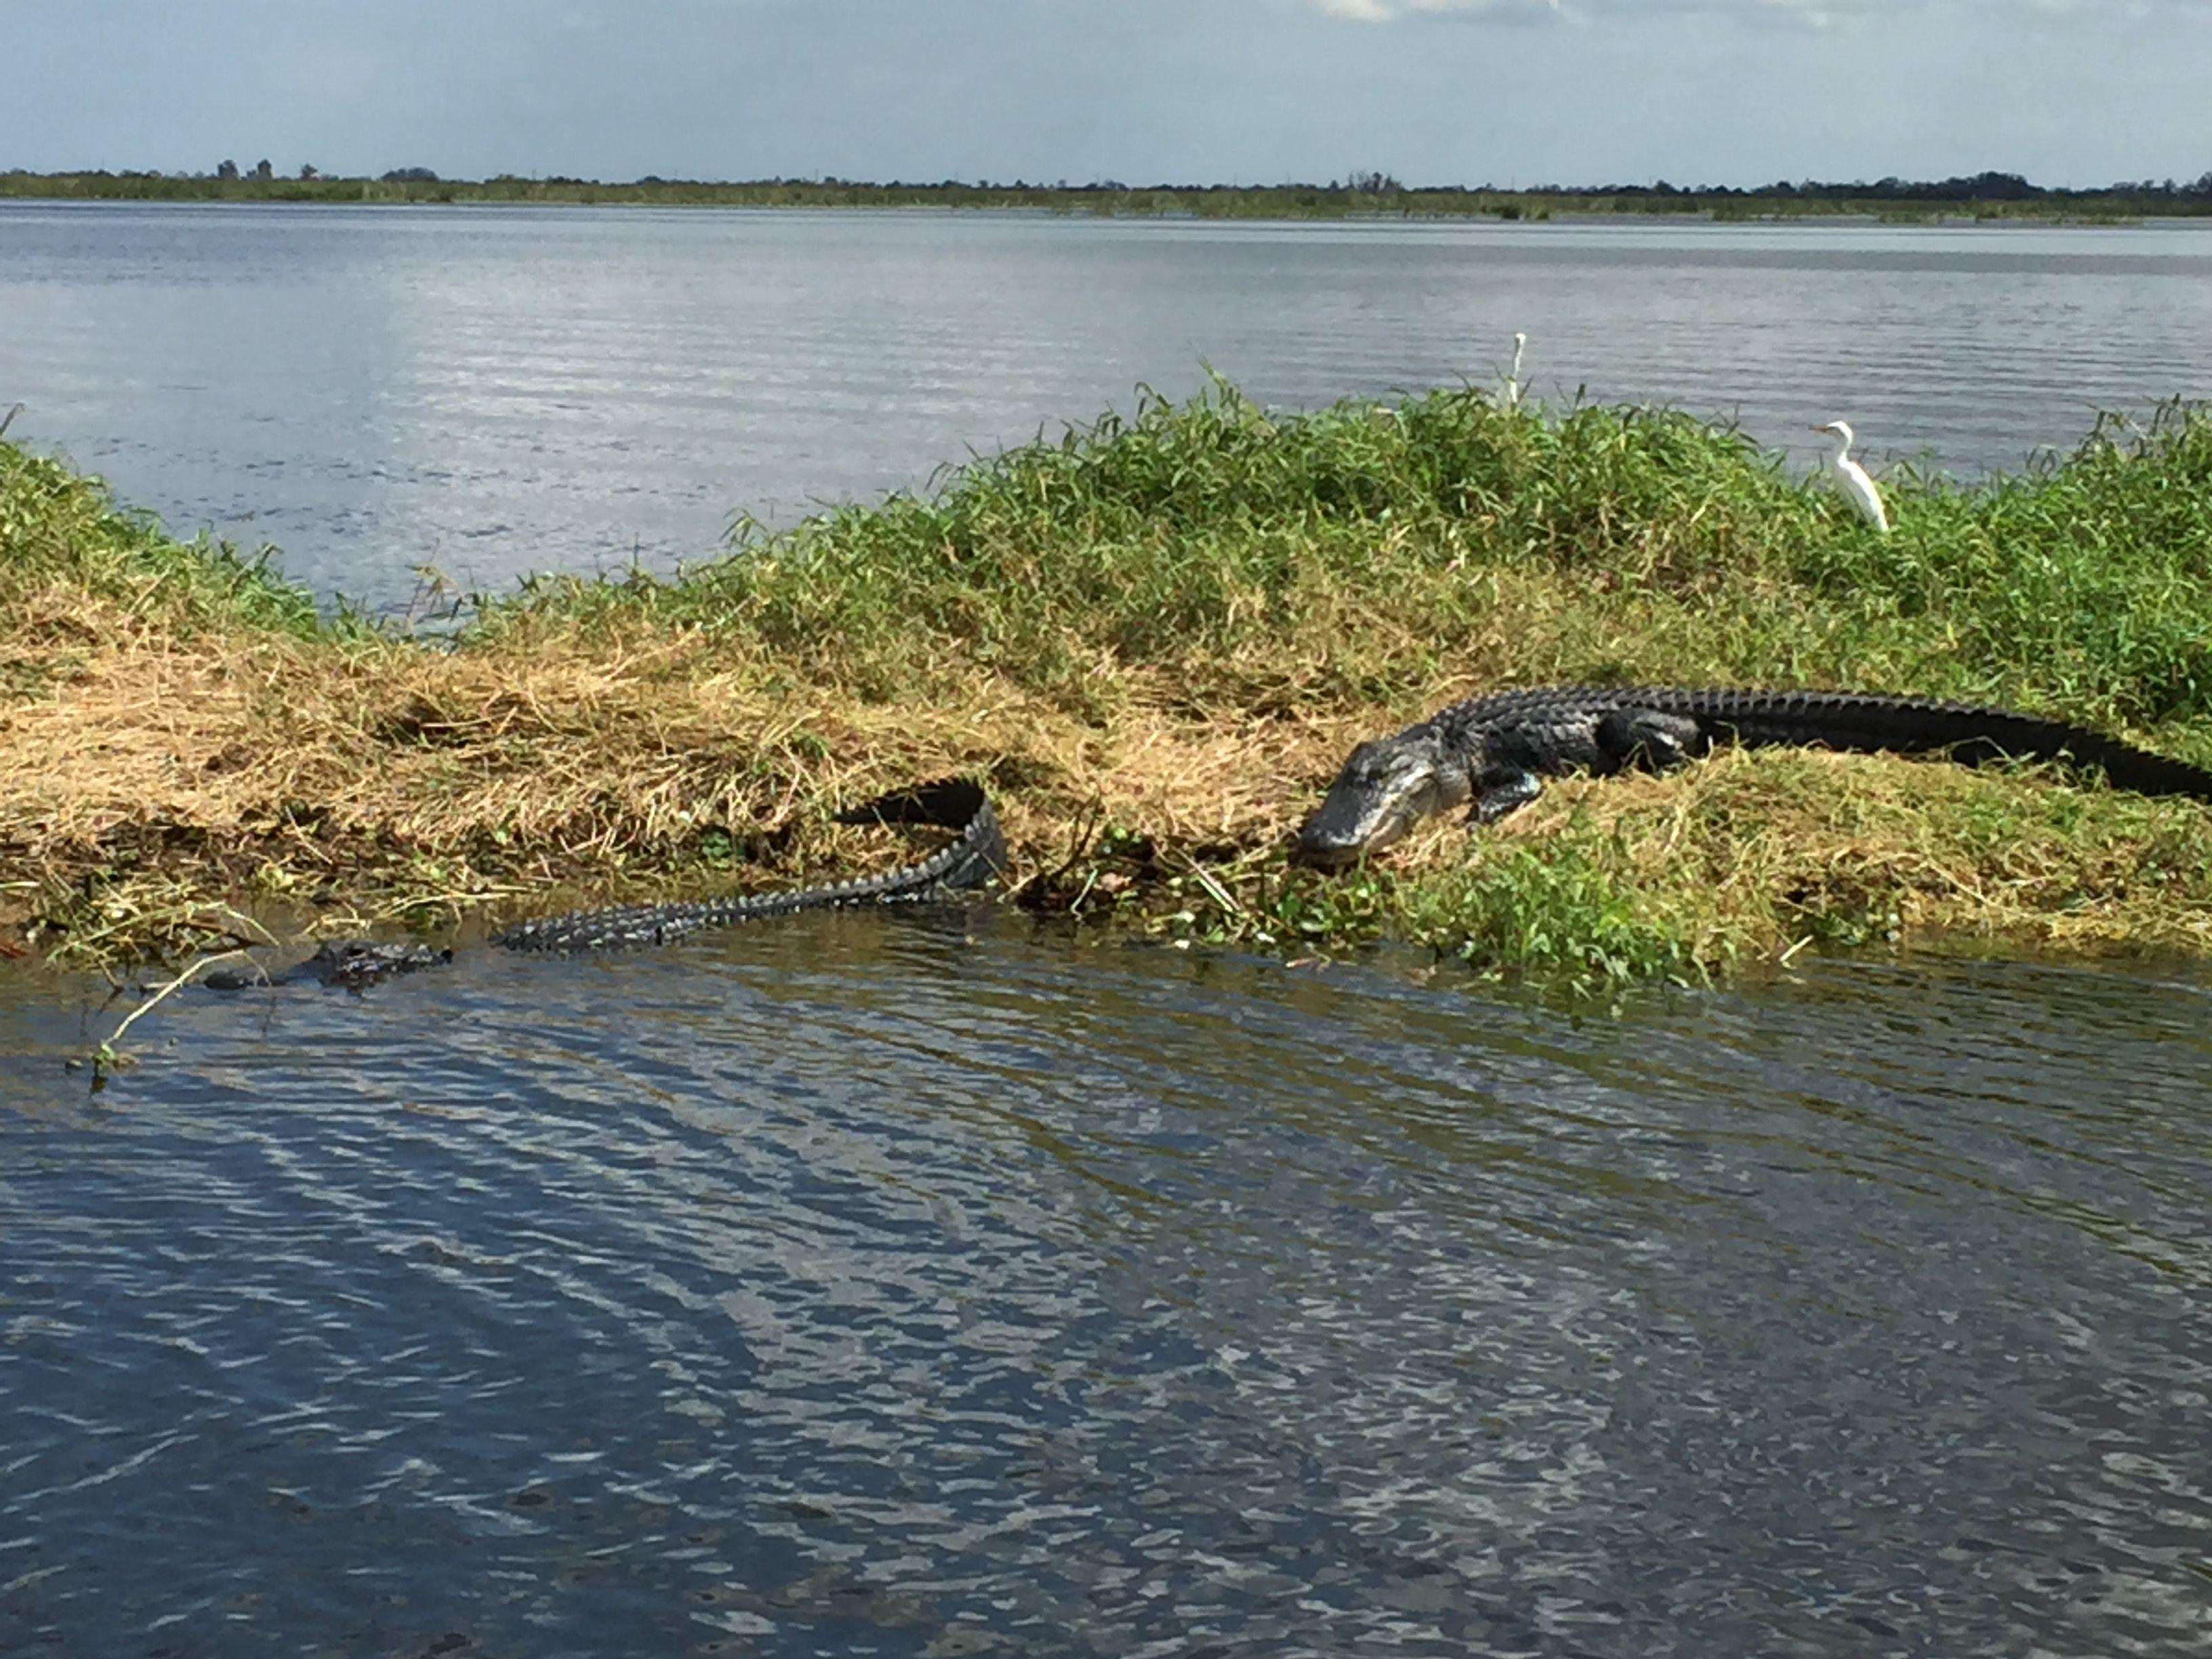 Gator vero florida rv destination outdoor river